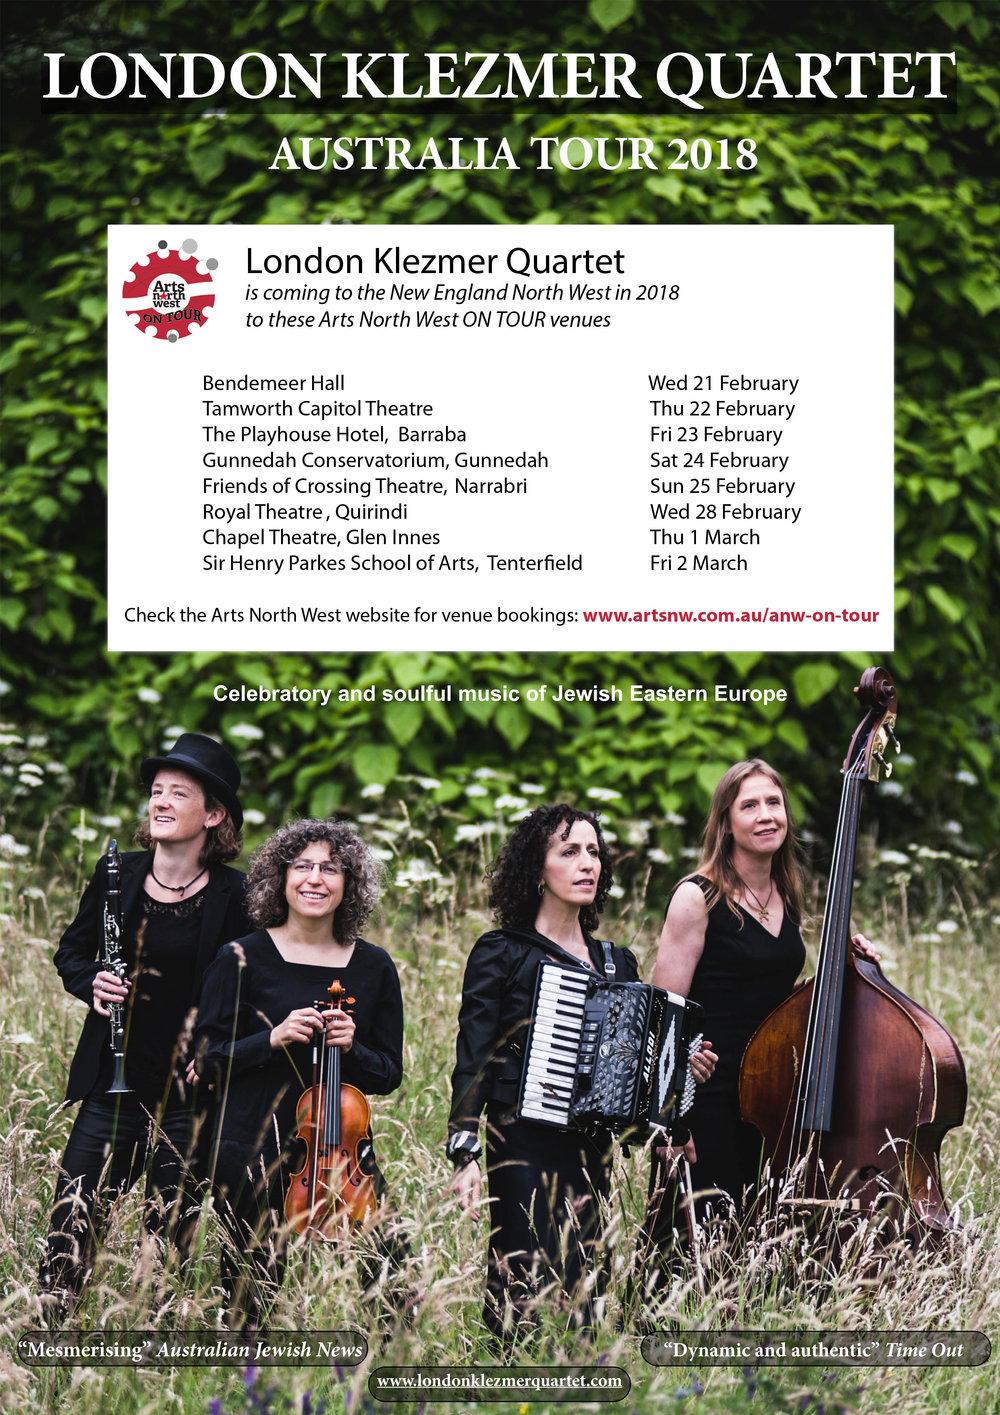 London Klezmer Quartet Australian Tour 2018.jpg